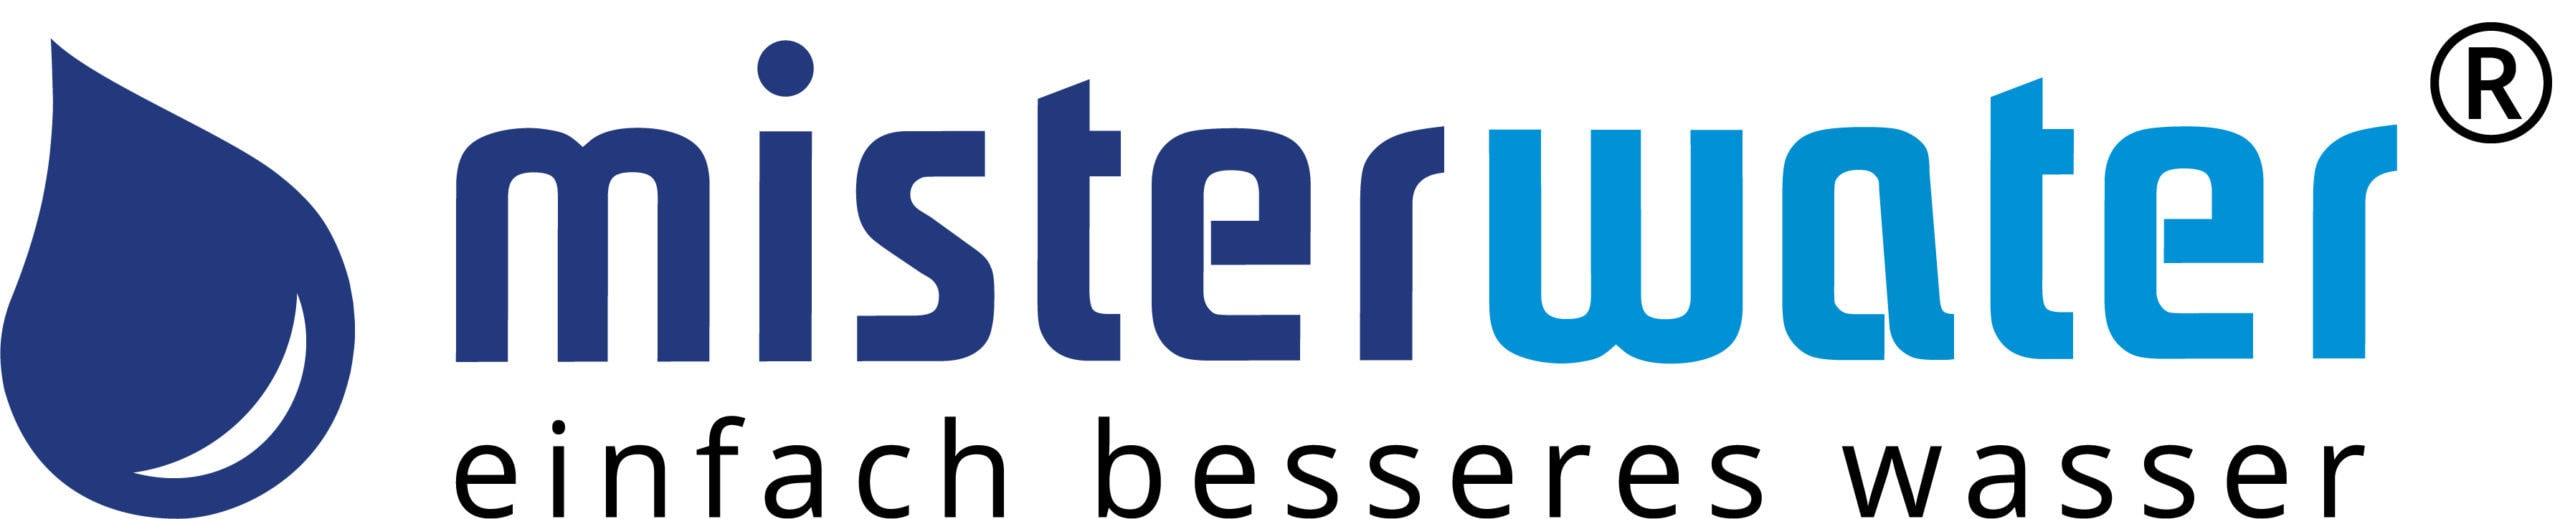 Misterwater